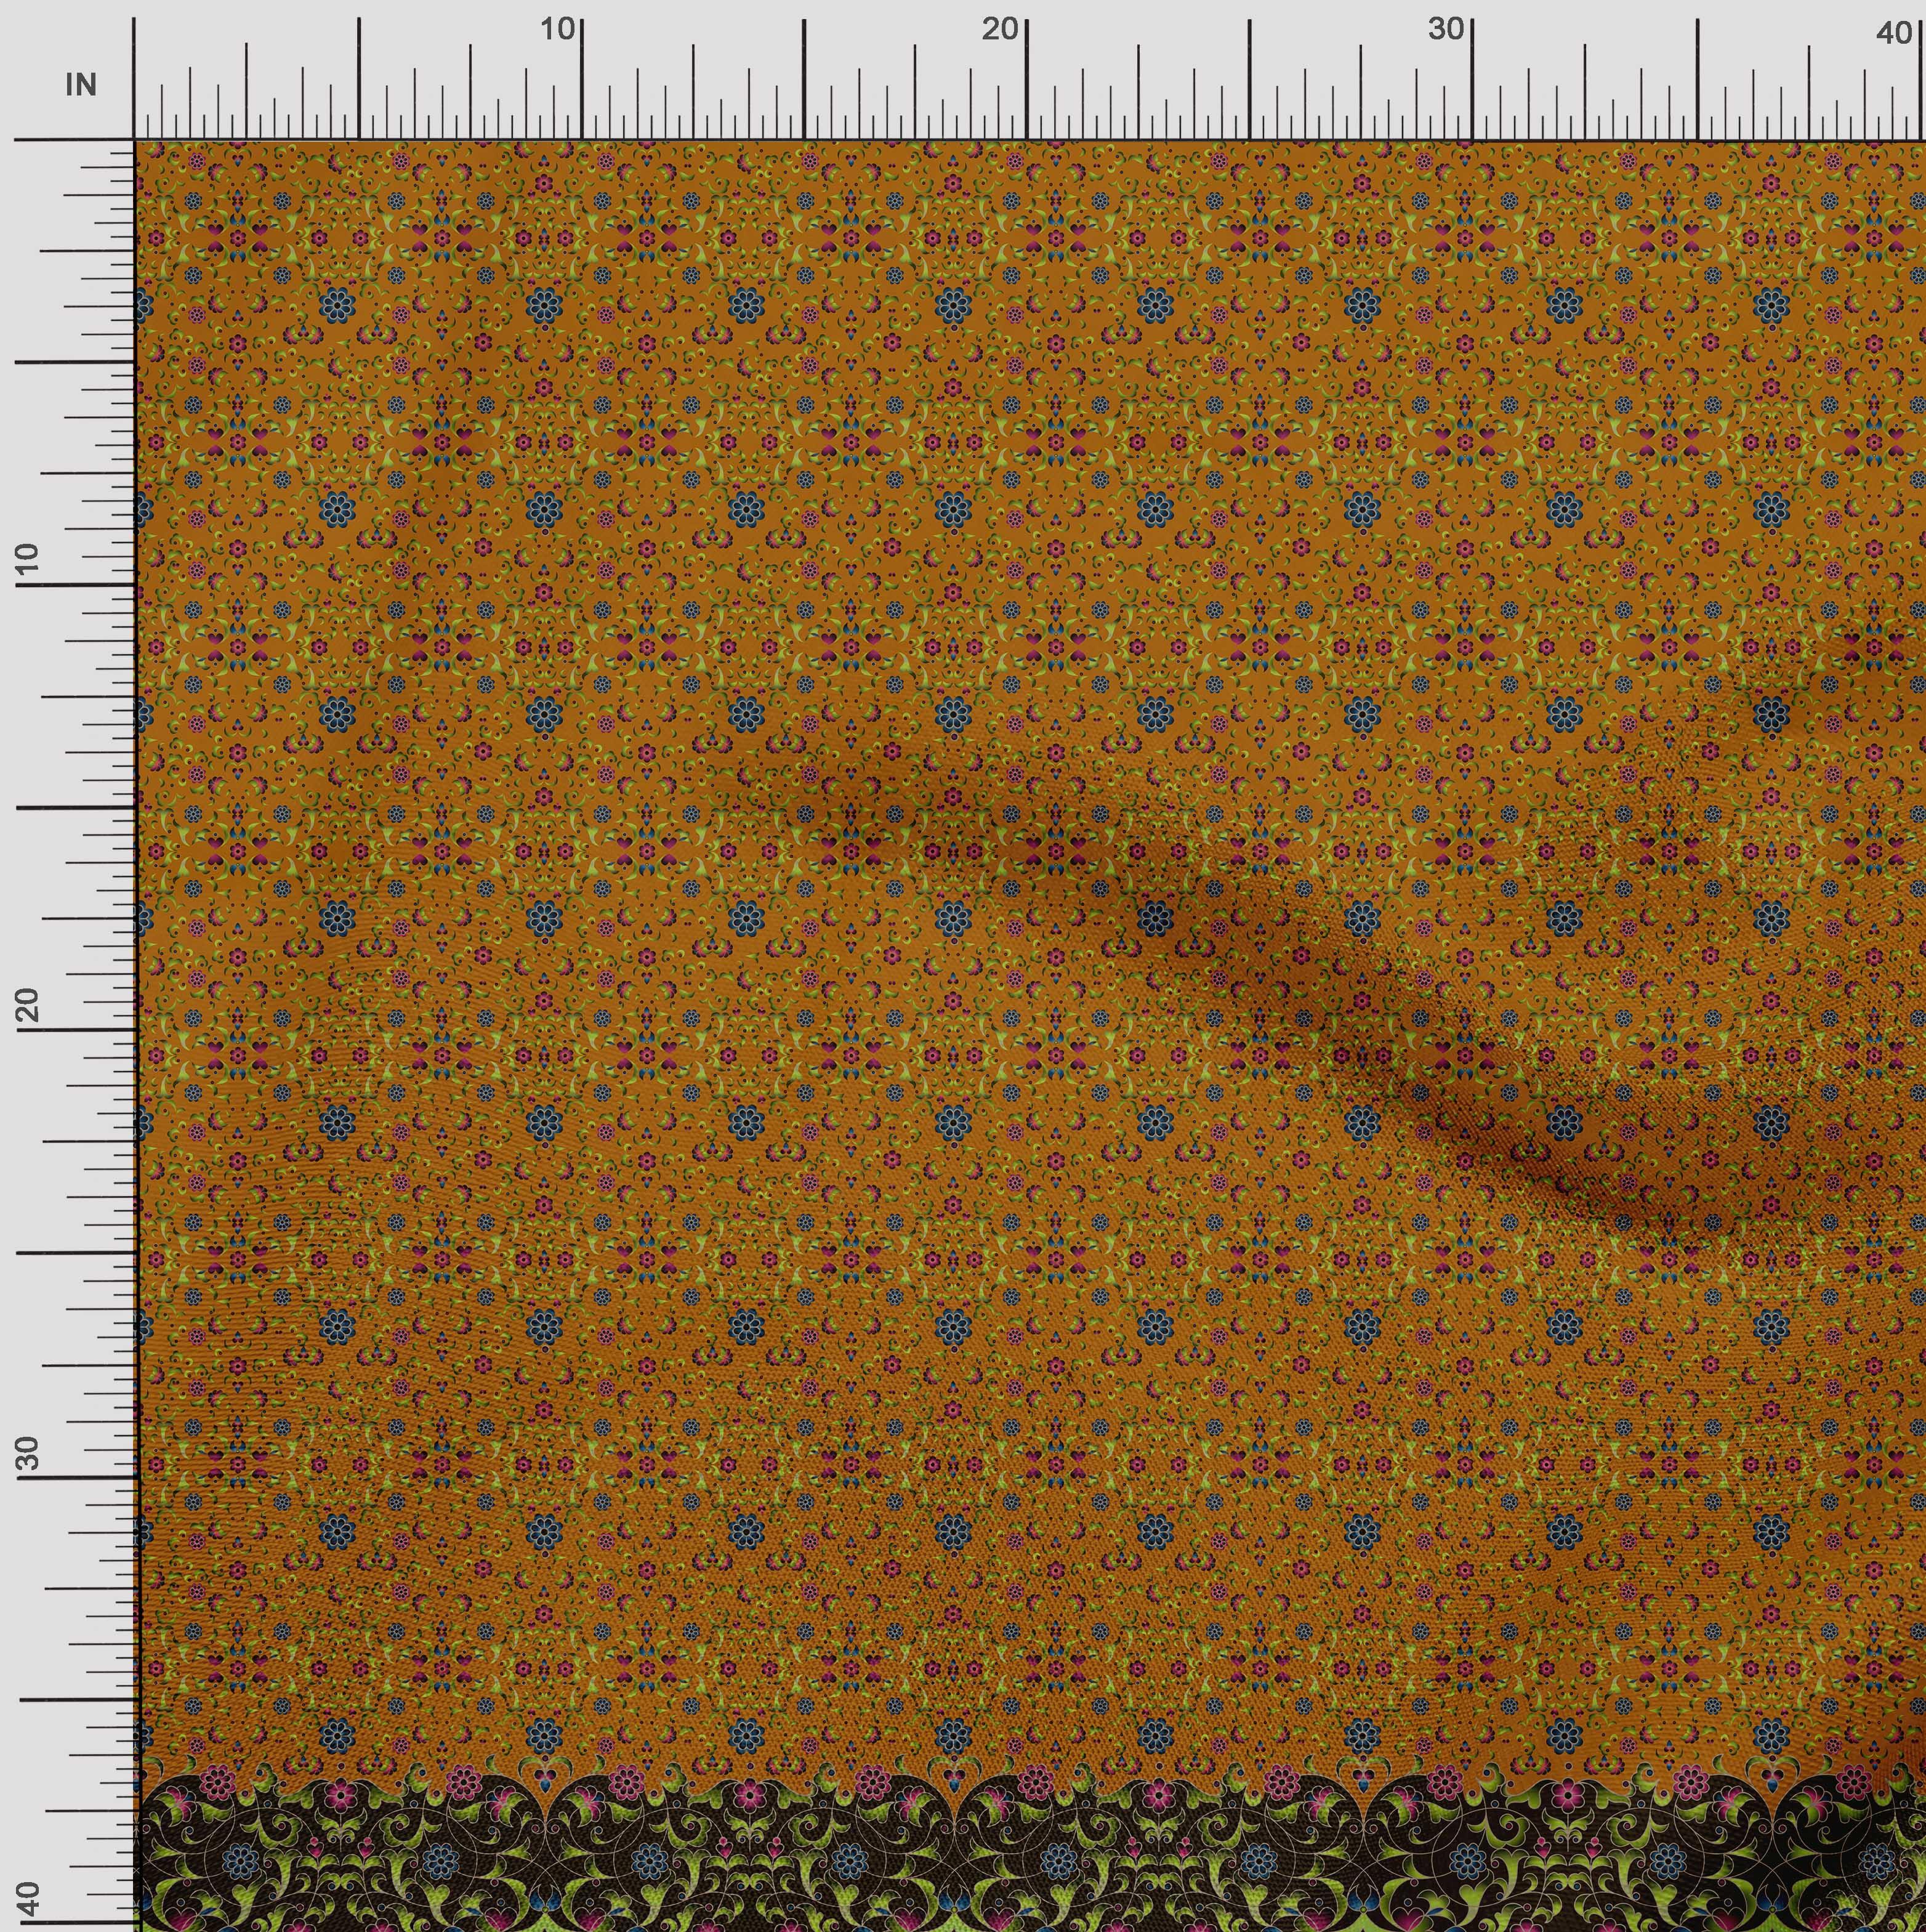 Soimoi-Cotton-Poplin-Fabric-Floral-amp-Leaves-Panel-Print-Fabric-by-5GU thumbnail 2